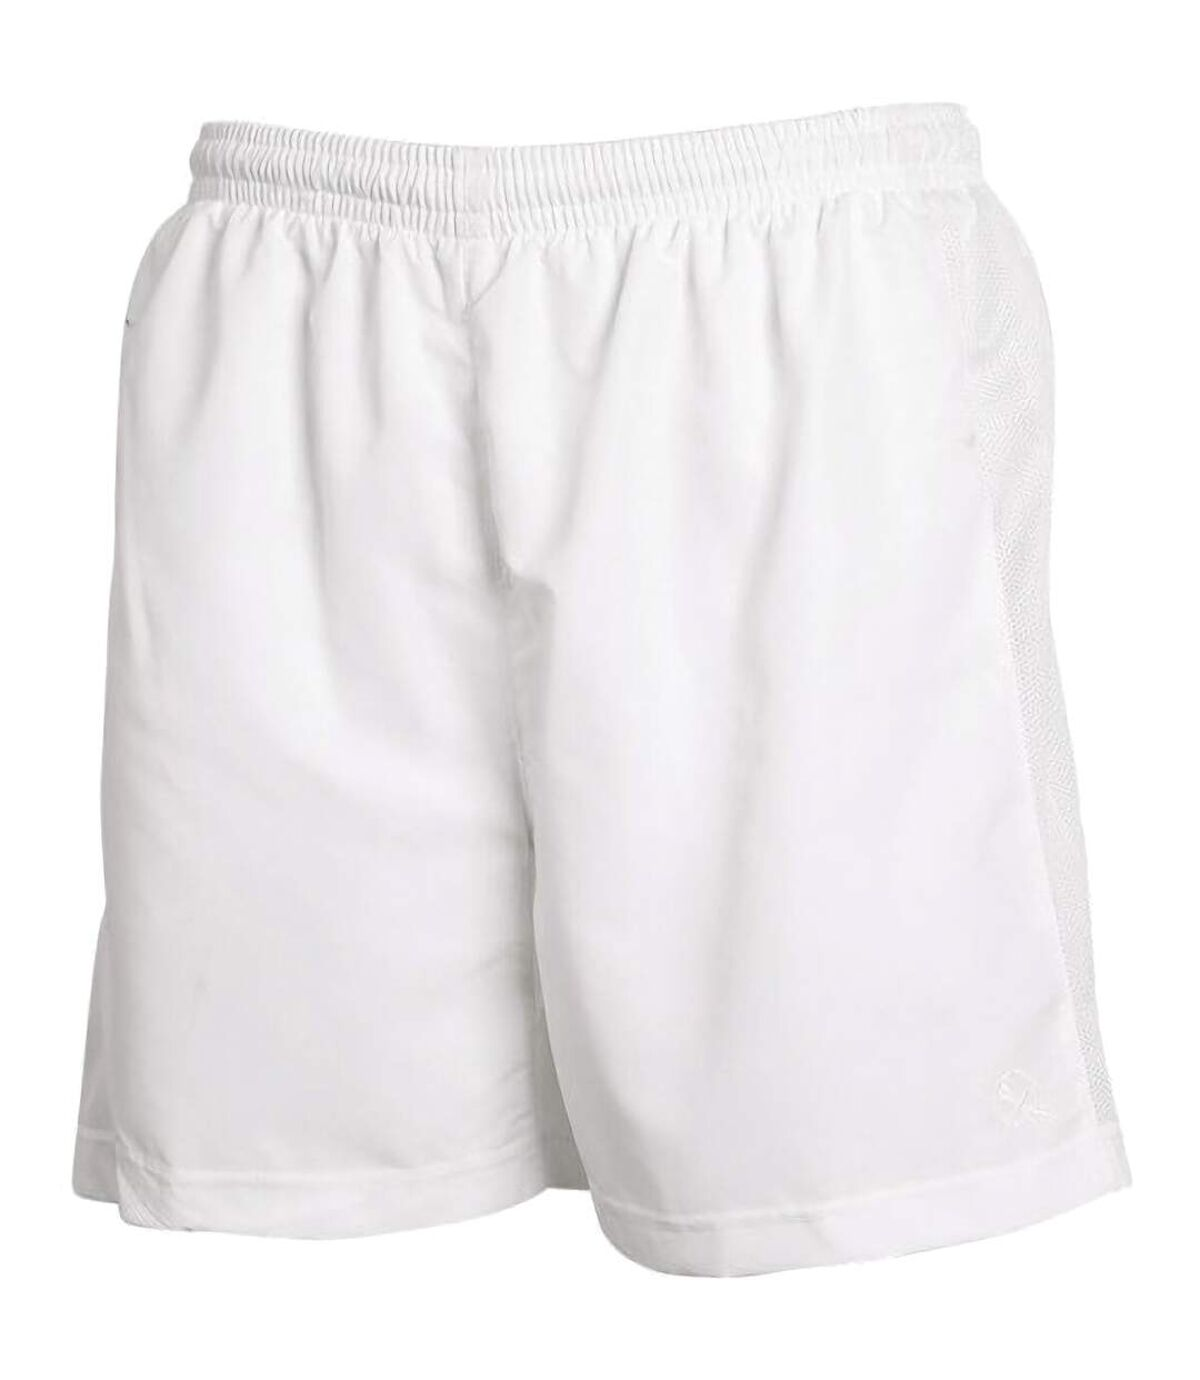 Tombo Teamsport Mens Lined Performance Sports Shorts (White) - UTRW1546